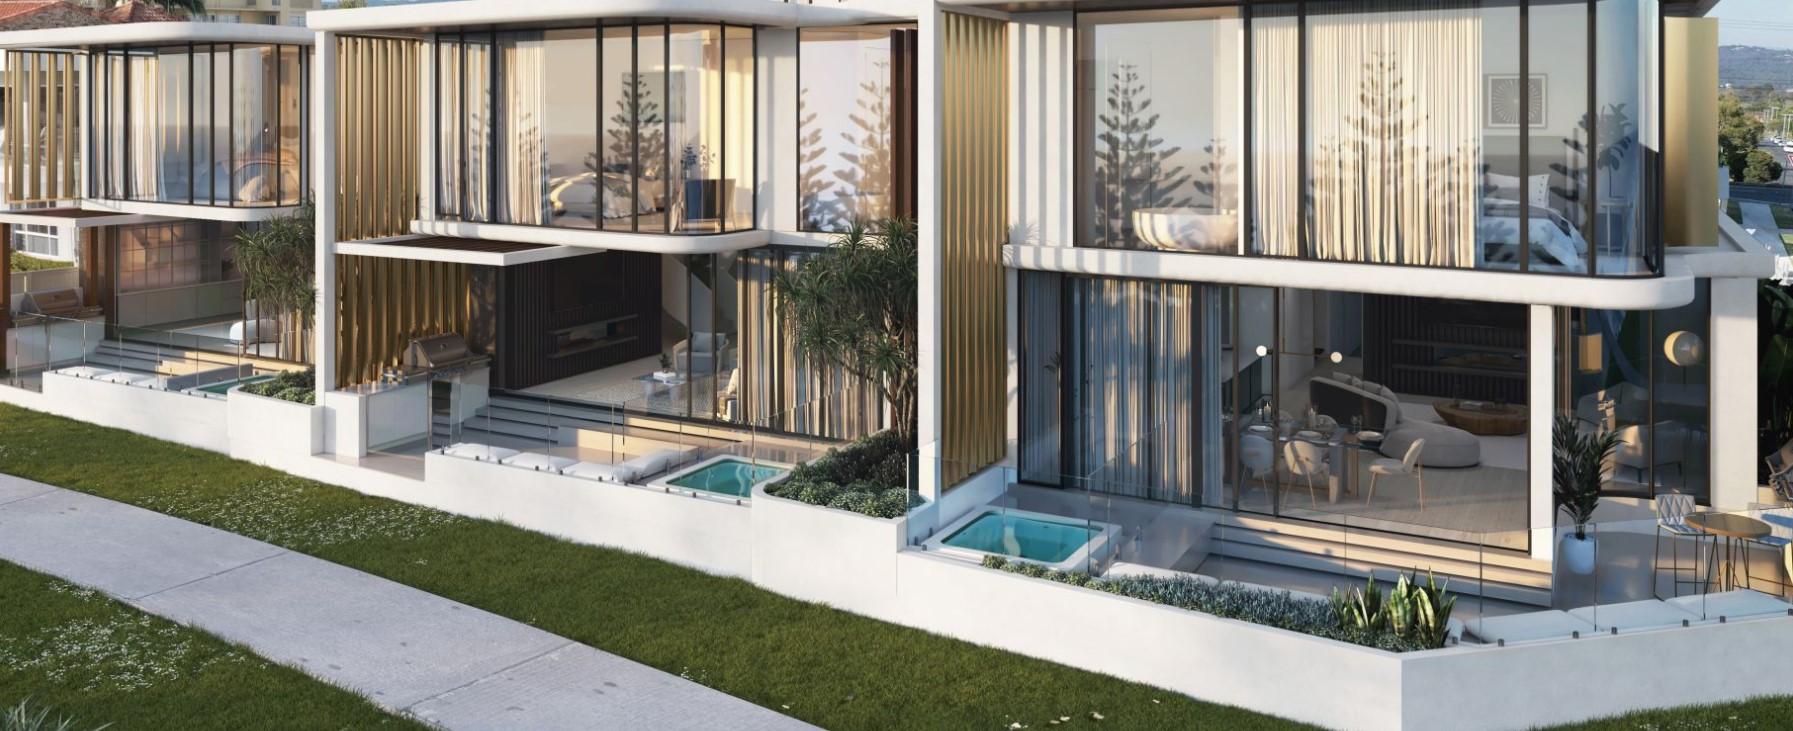 https://www.kollosche.com.au/488-the-esplanade-palm-beach-qld-6028807/